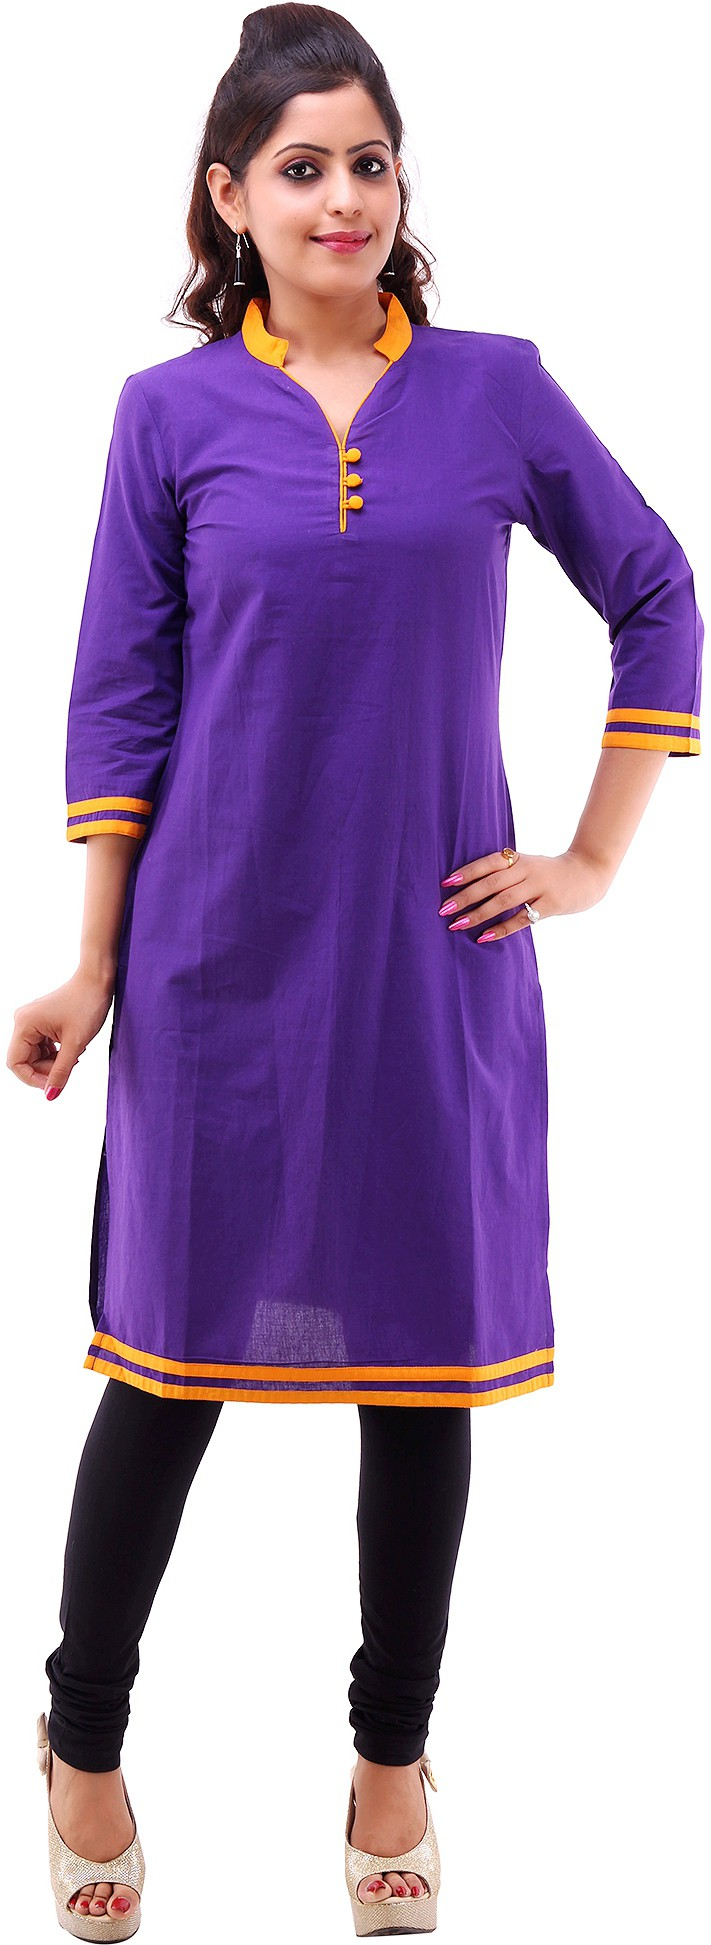 Shubh Solid Womens Straight Kurta(Purple)